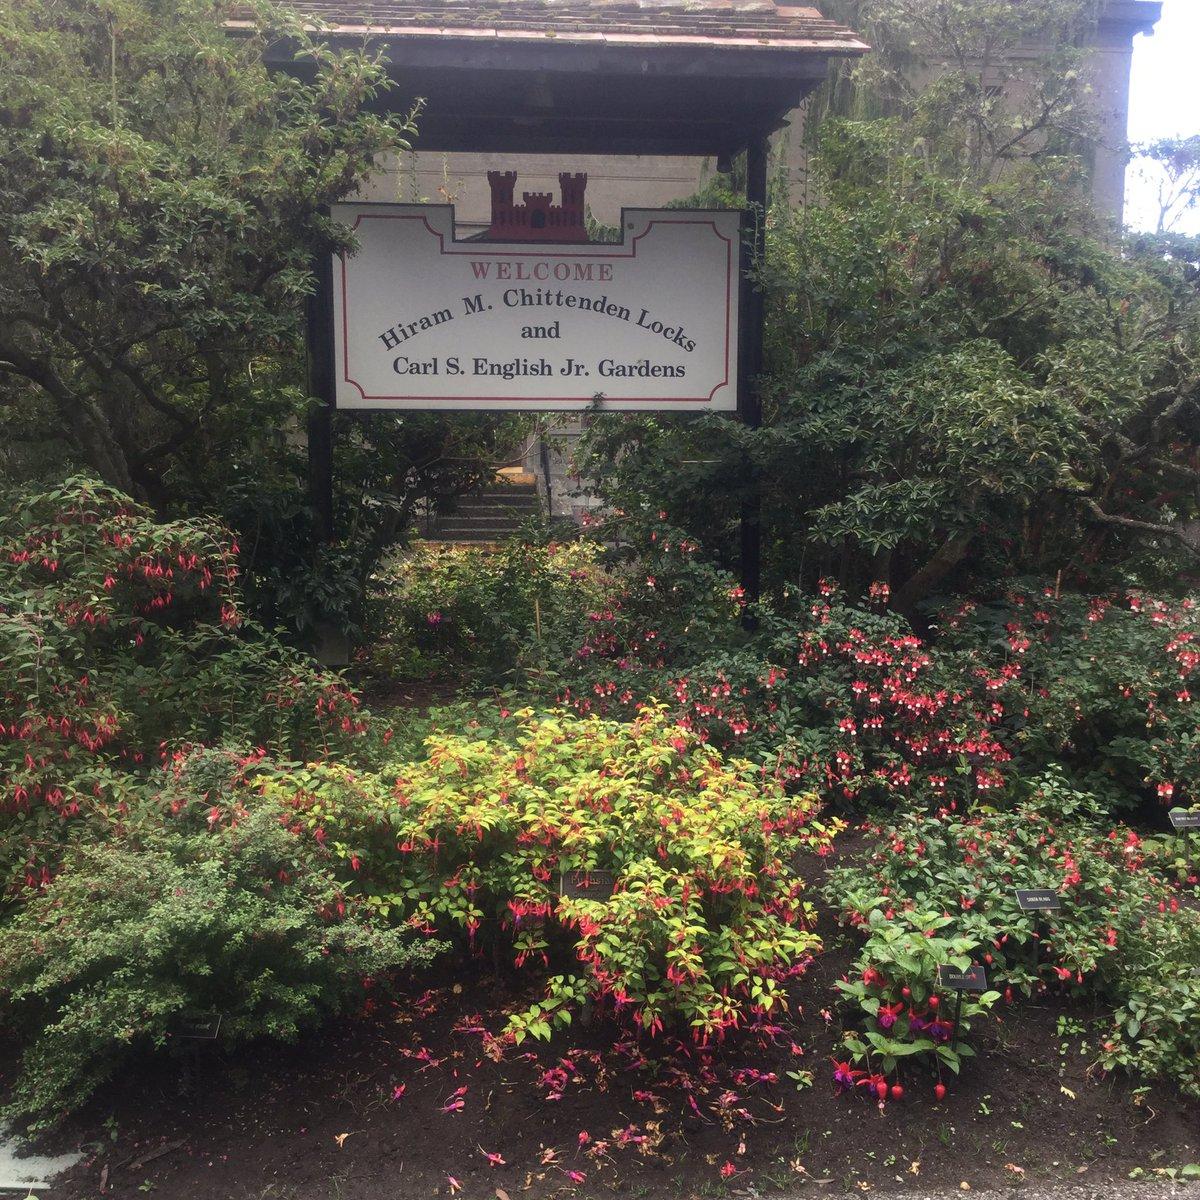 Fun visit to a surprise Seattle garden for #FuchsiaFriday #gardenchat <br>http://pic.twitter.com/oyabBpQi9x &ndash; at Hiram M. Chittenden Locks